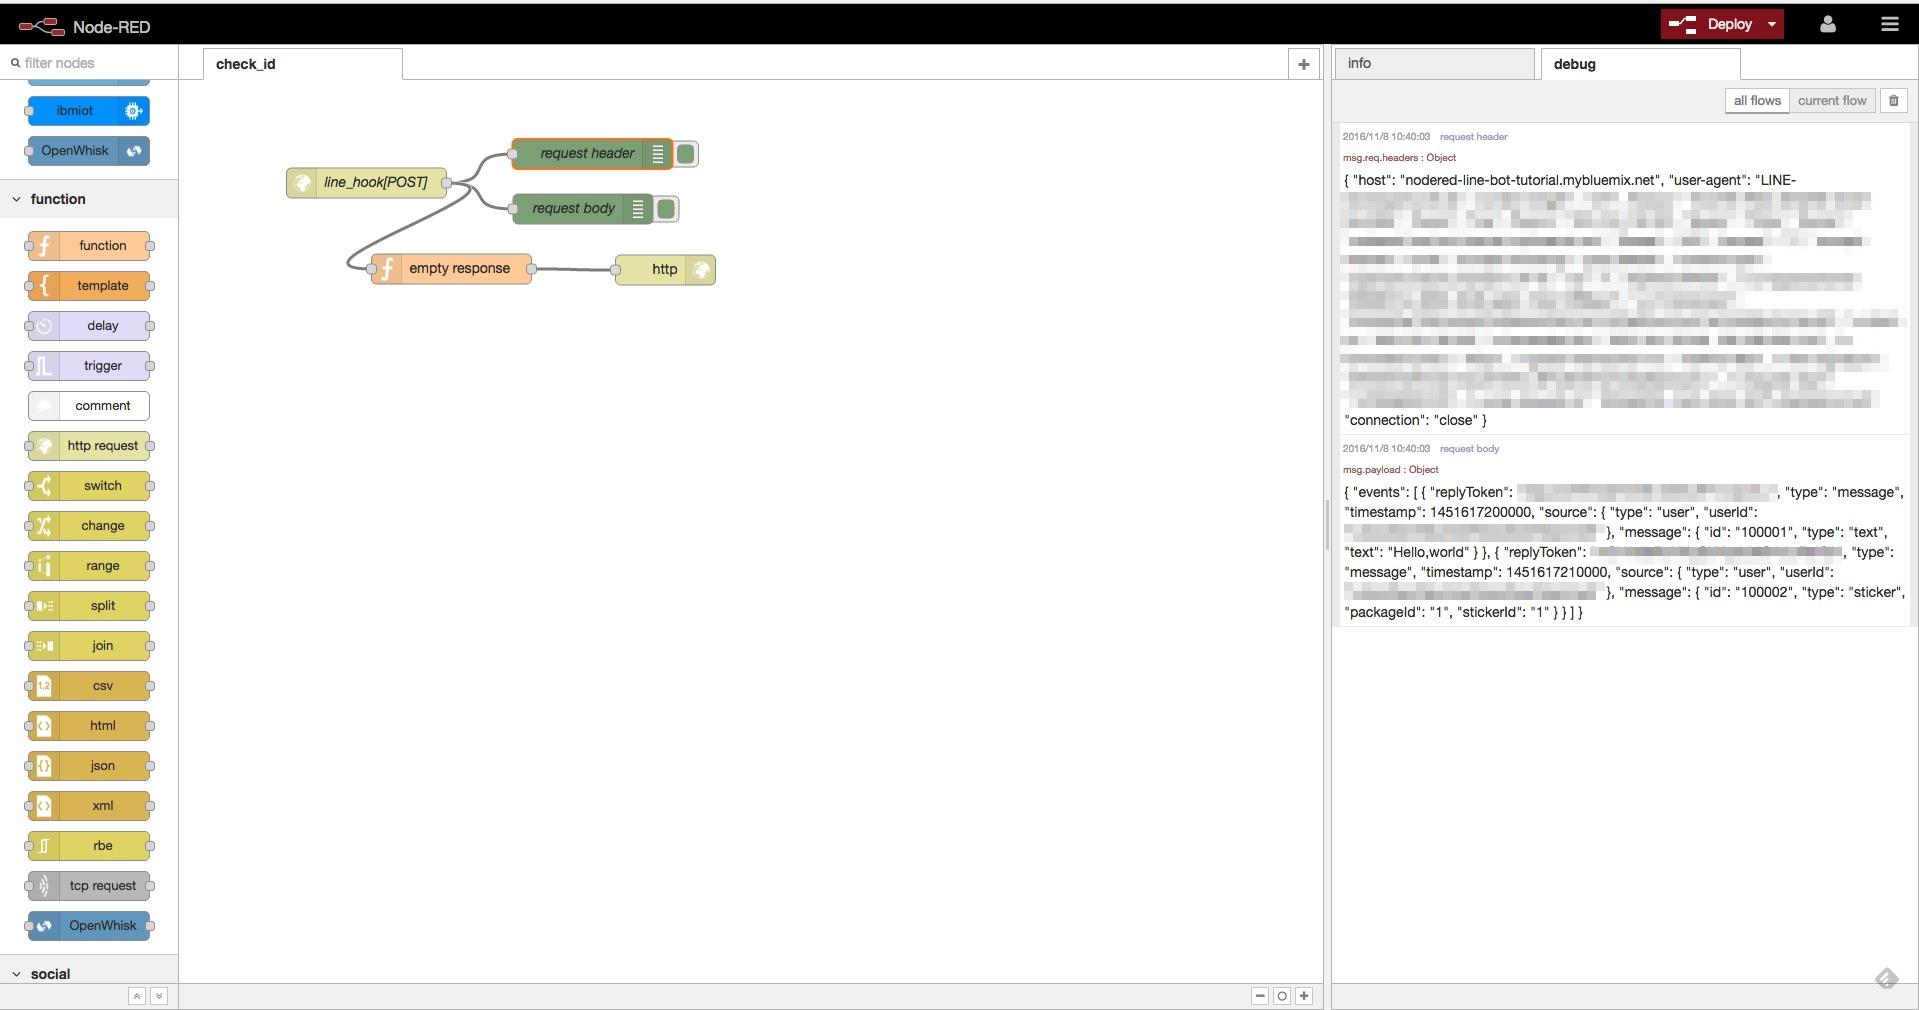 Node-REDでWebサーバのリクエストを監視する方法を説明する図